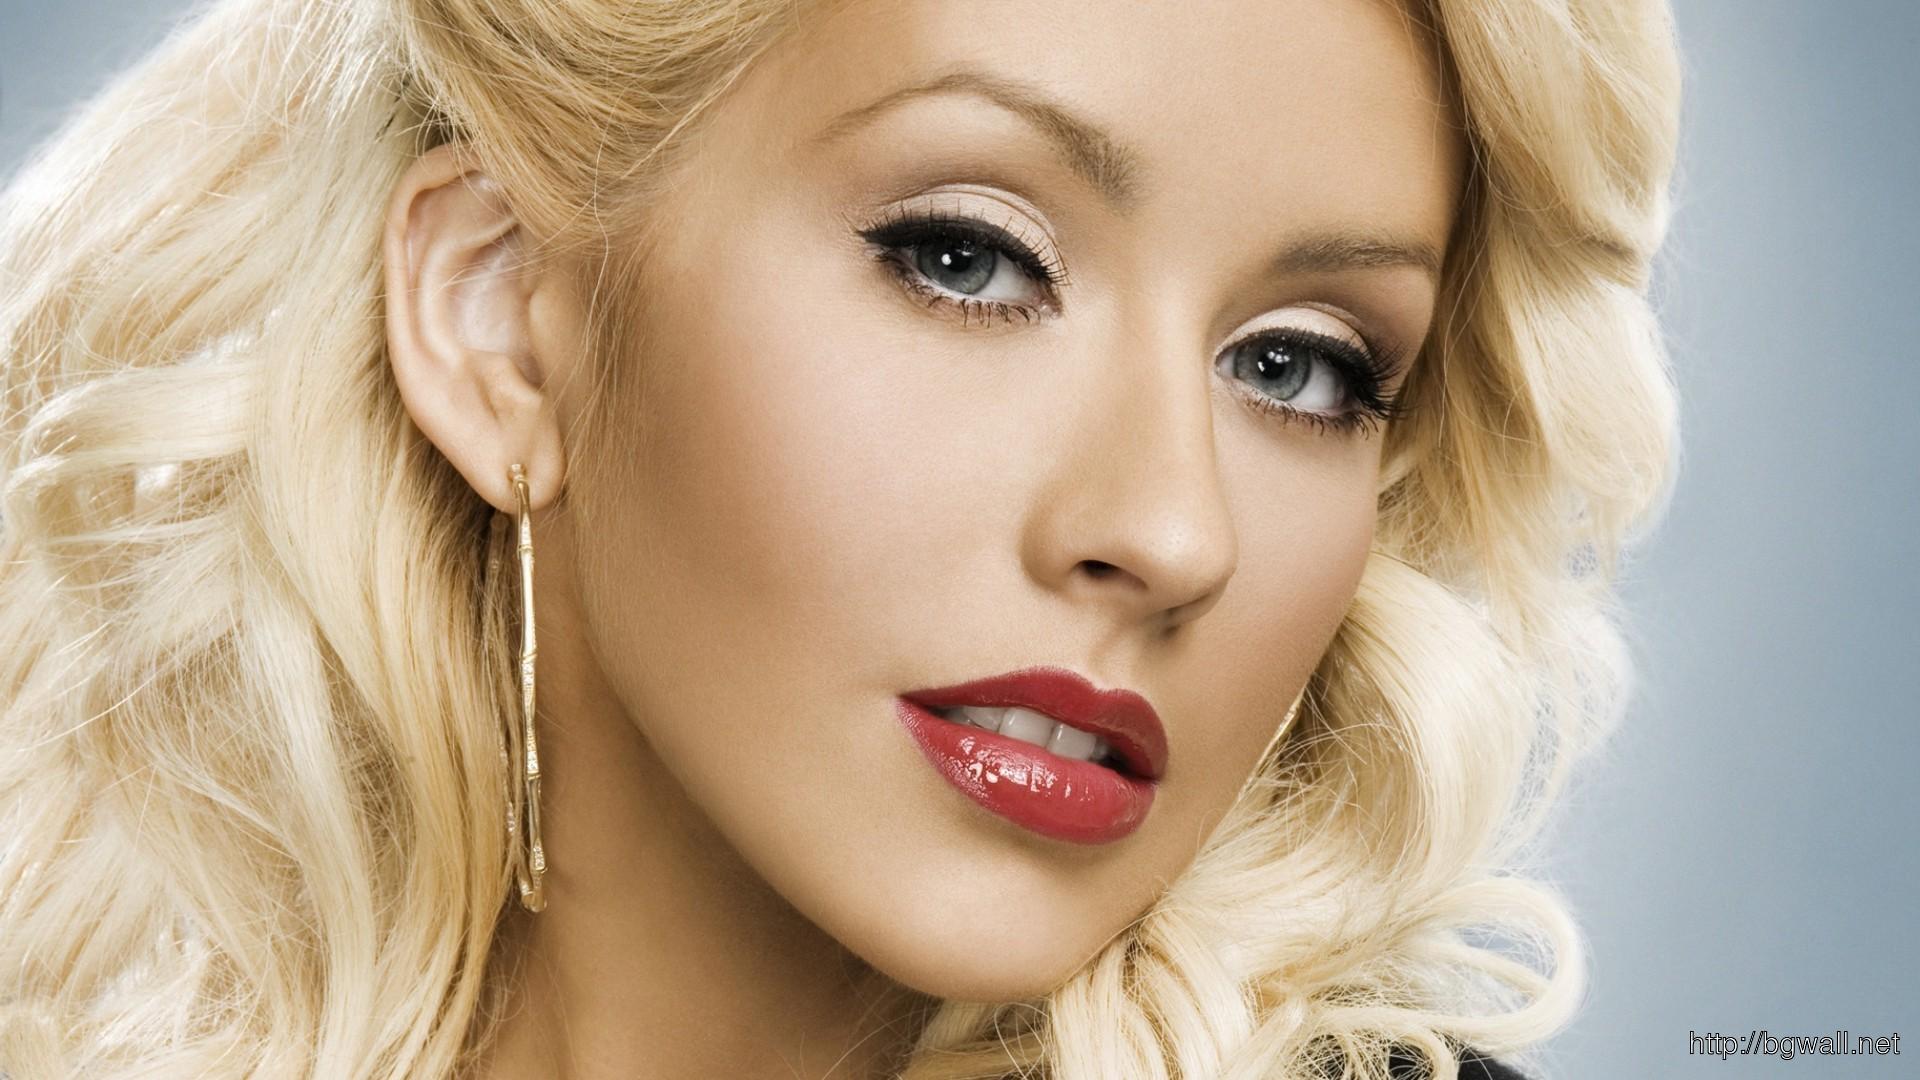 Christina Aguilera Wallpaper 3850 Full Size